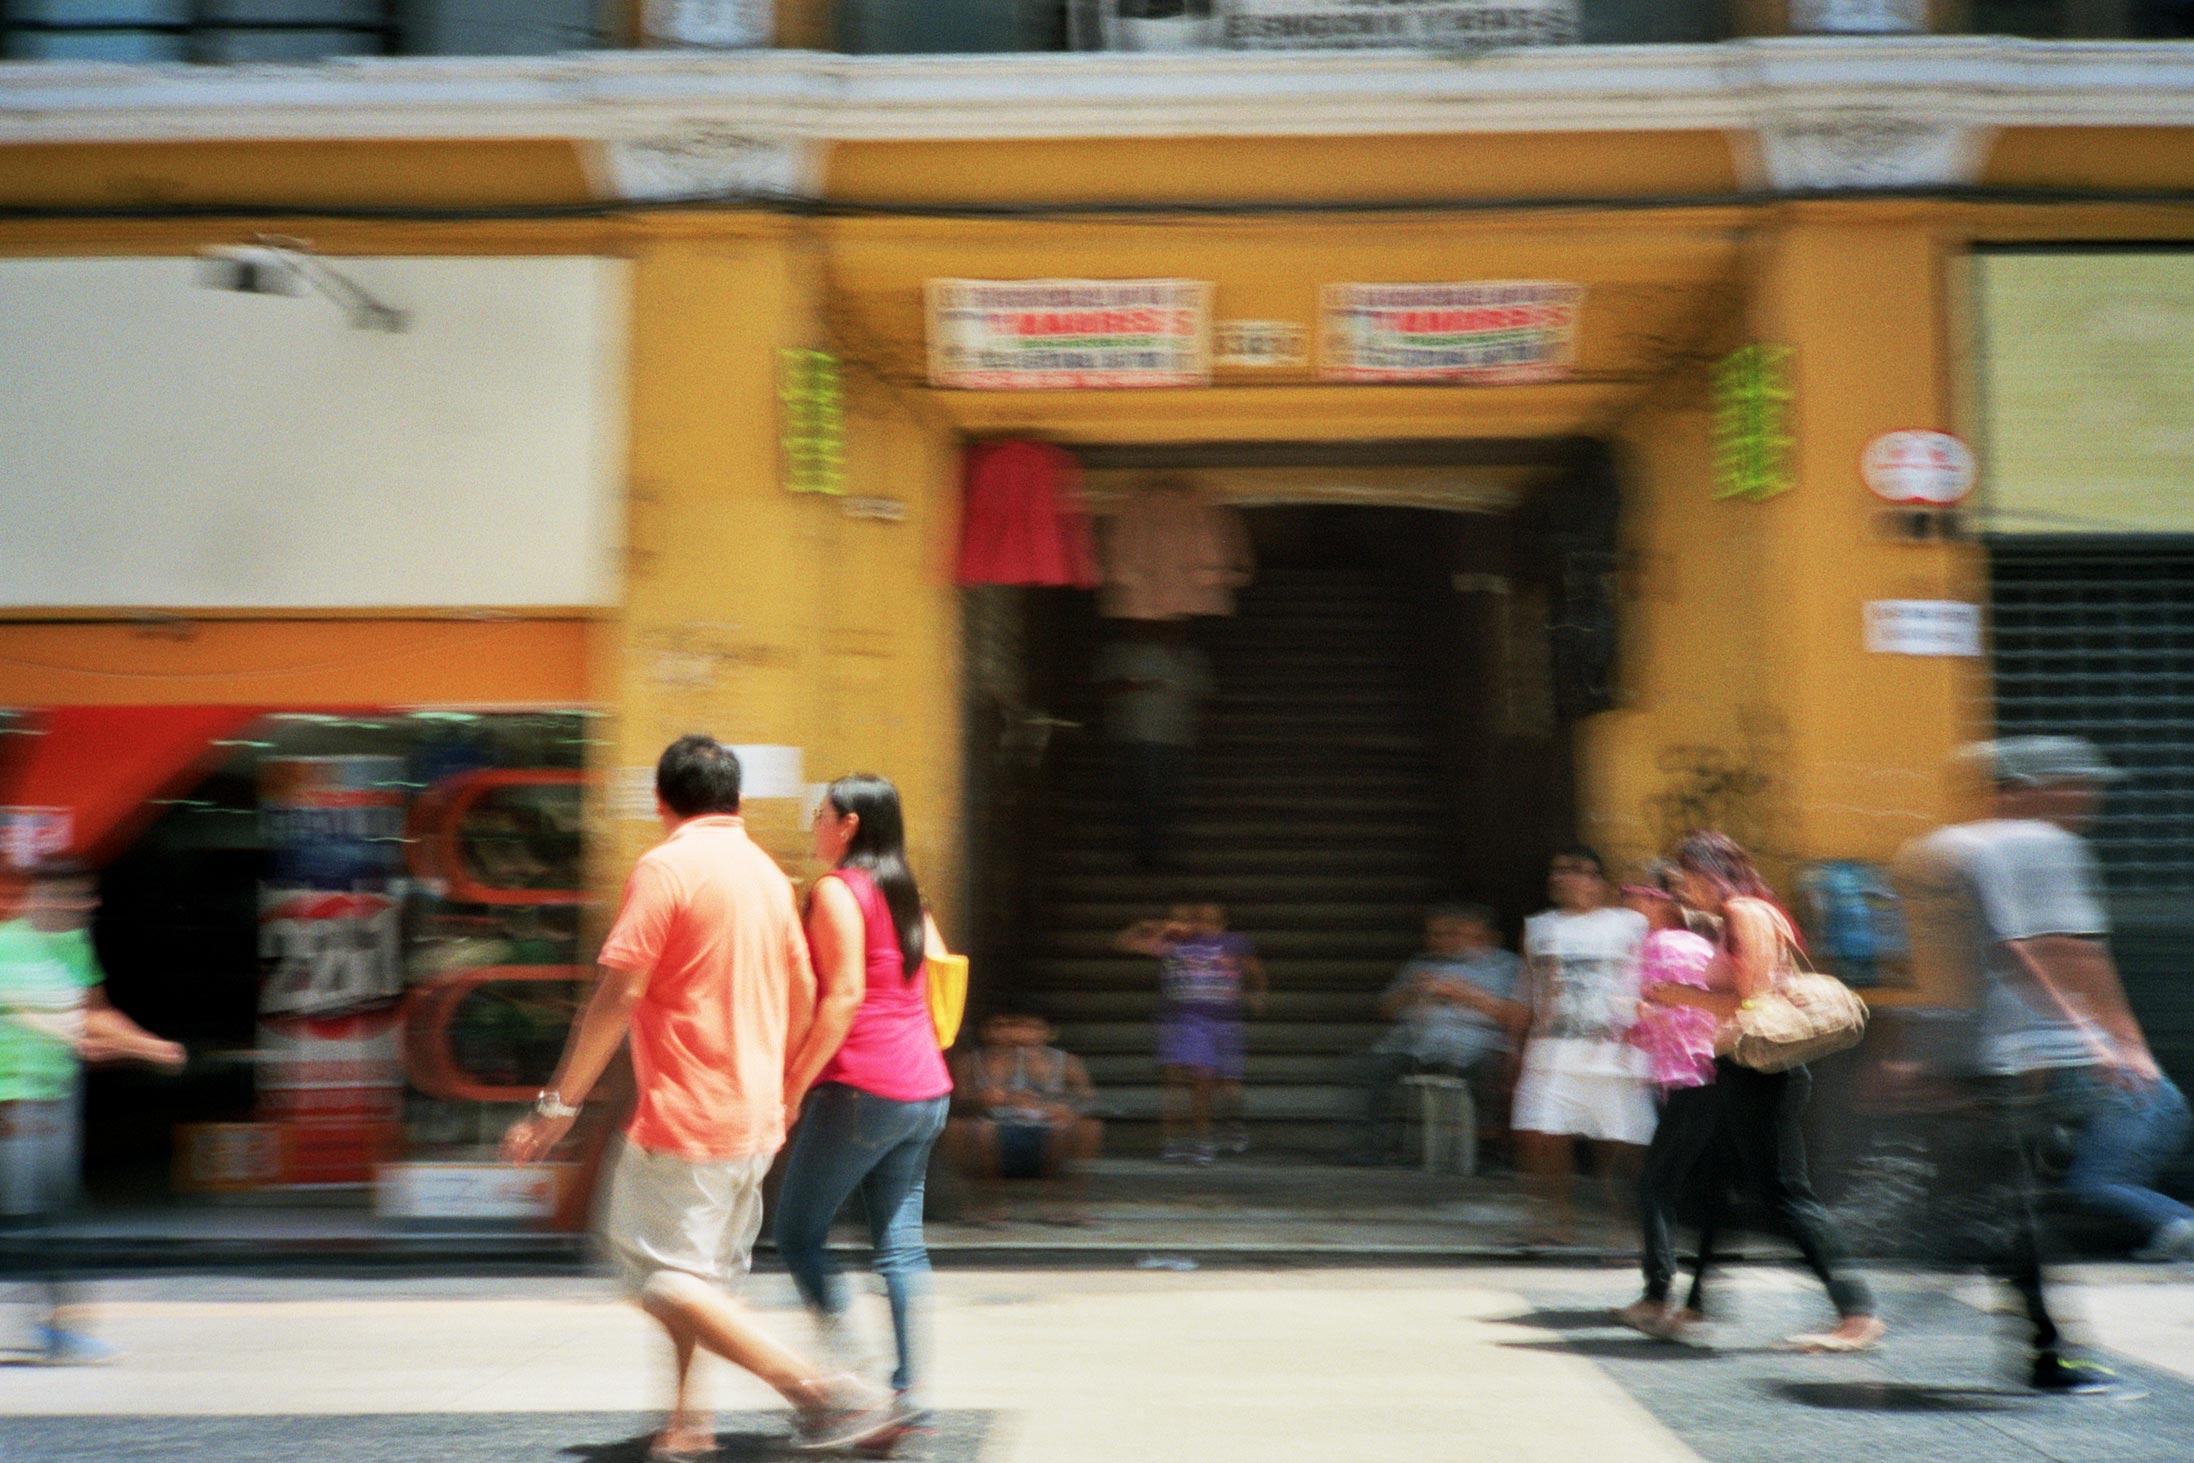 Peru Lima Centro shopping